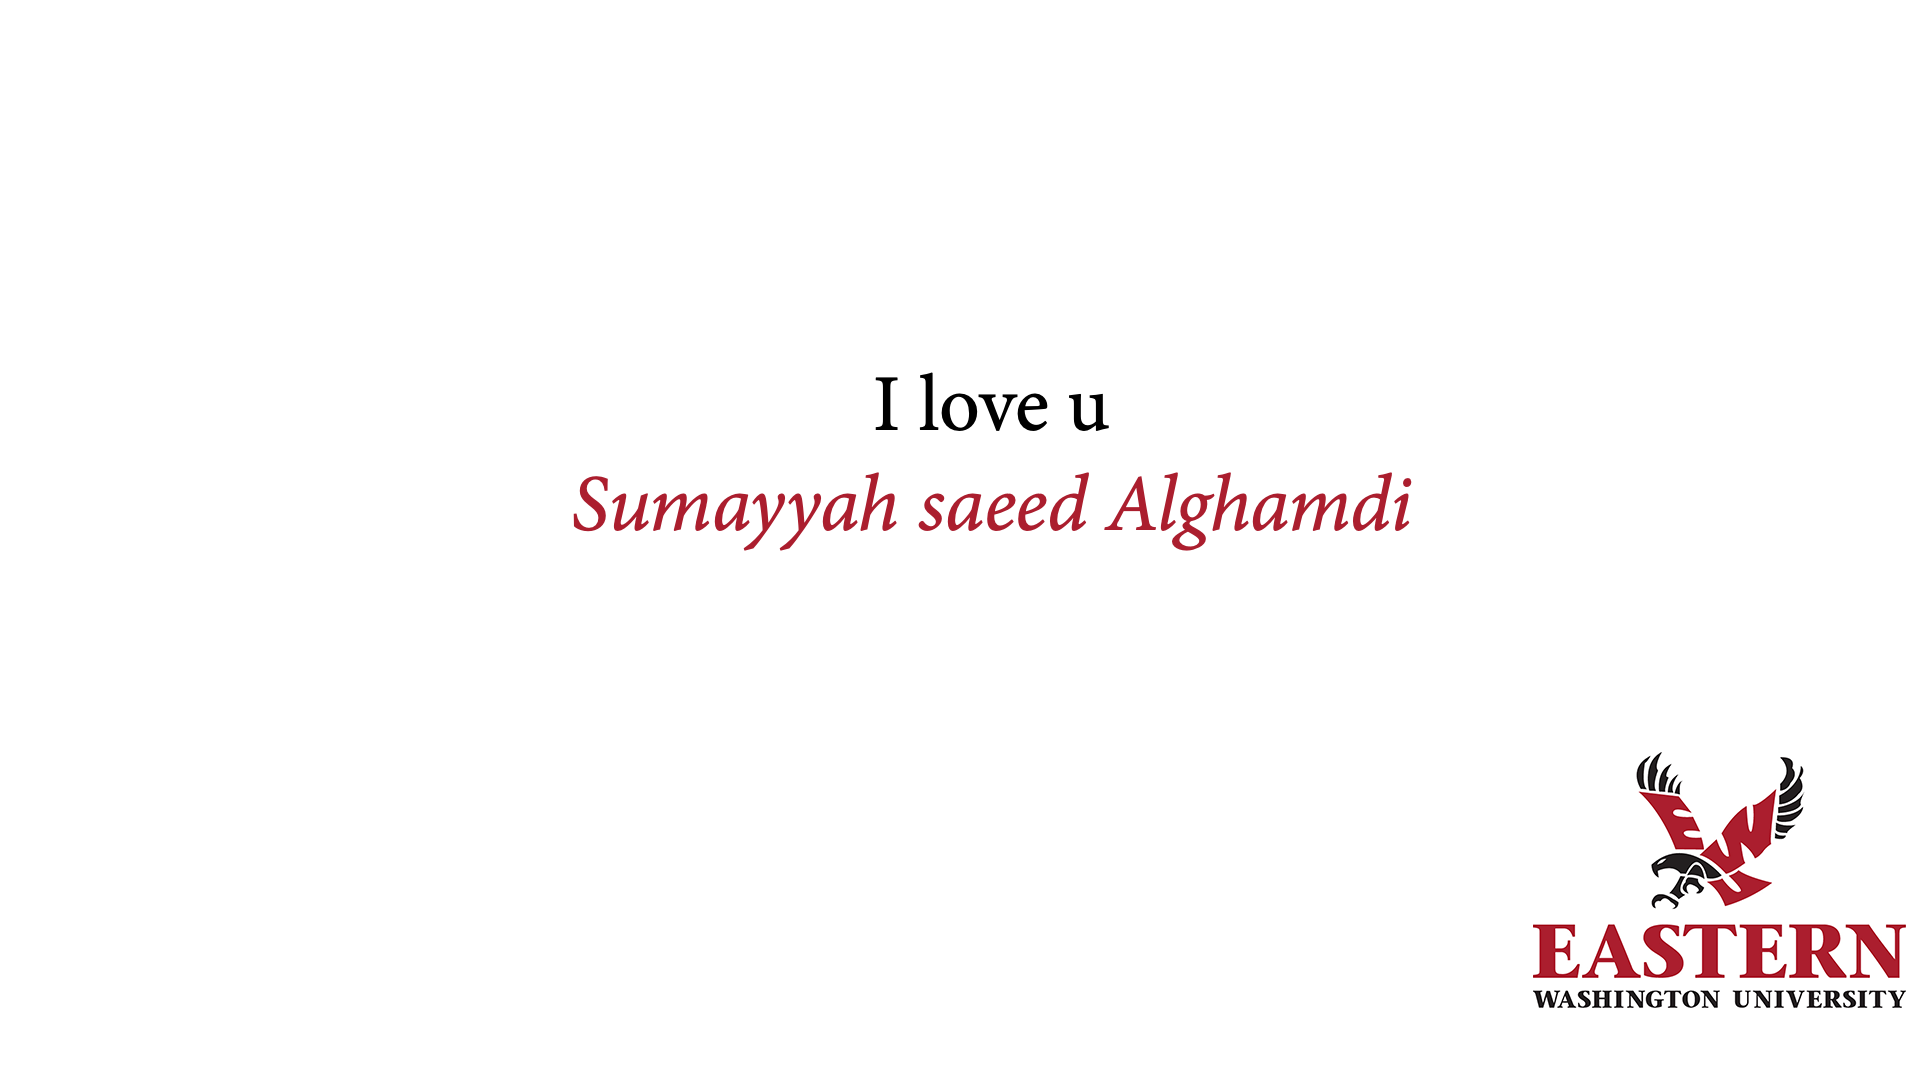 tbi_abdullah-saeed-s-alghamdi_7515.png